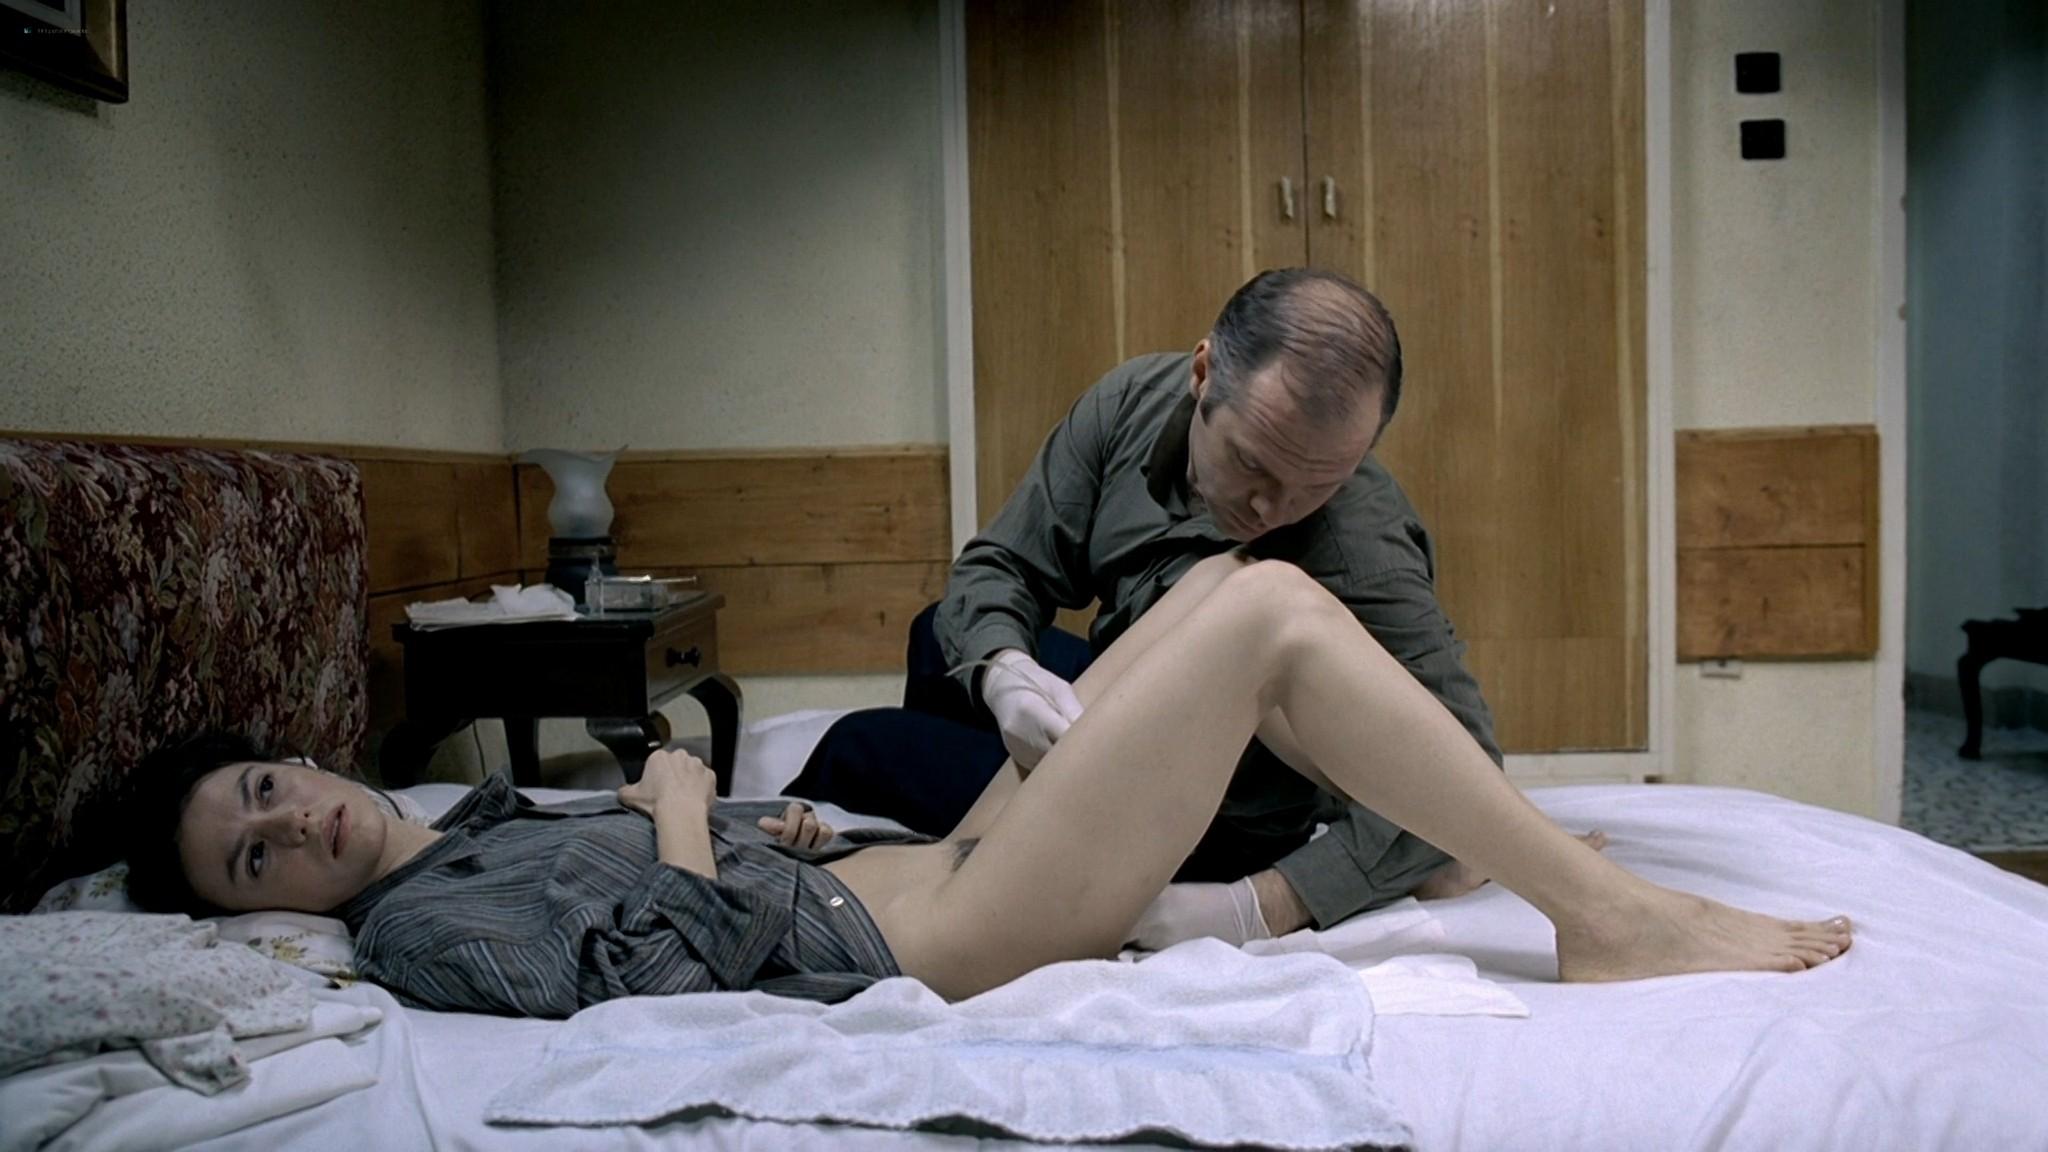 Laura Vasiliu nude bush Anamaria Marinca nude too 4 Months 3 Weeks and 2 Days RO 2007 1080p BluRay 010